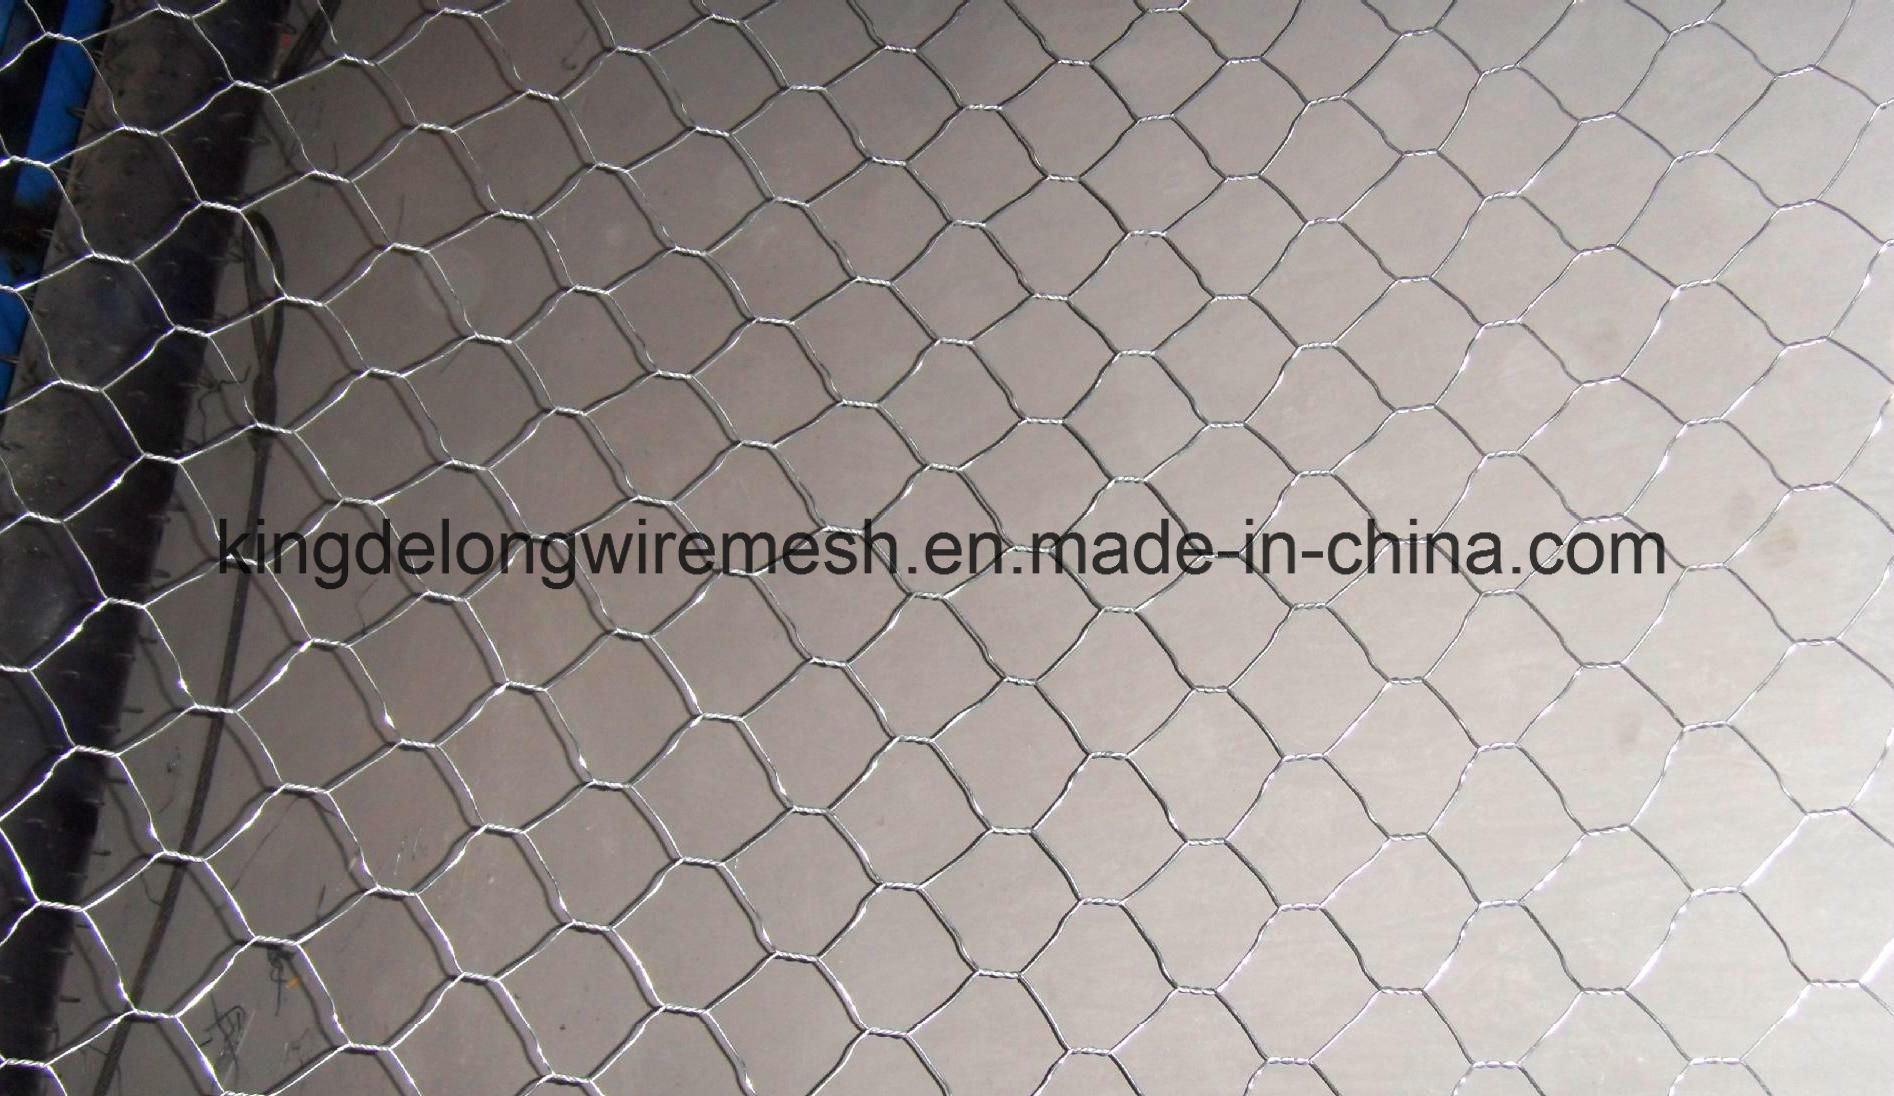 Hexagonal Wire Netting From Kdl